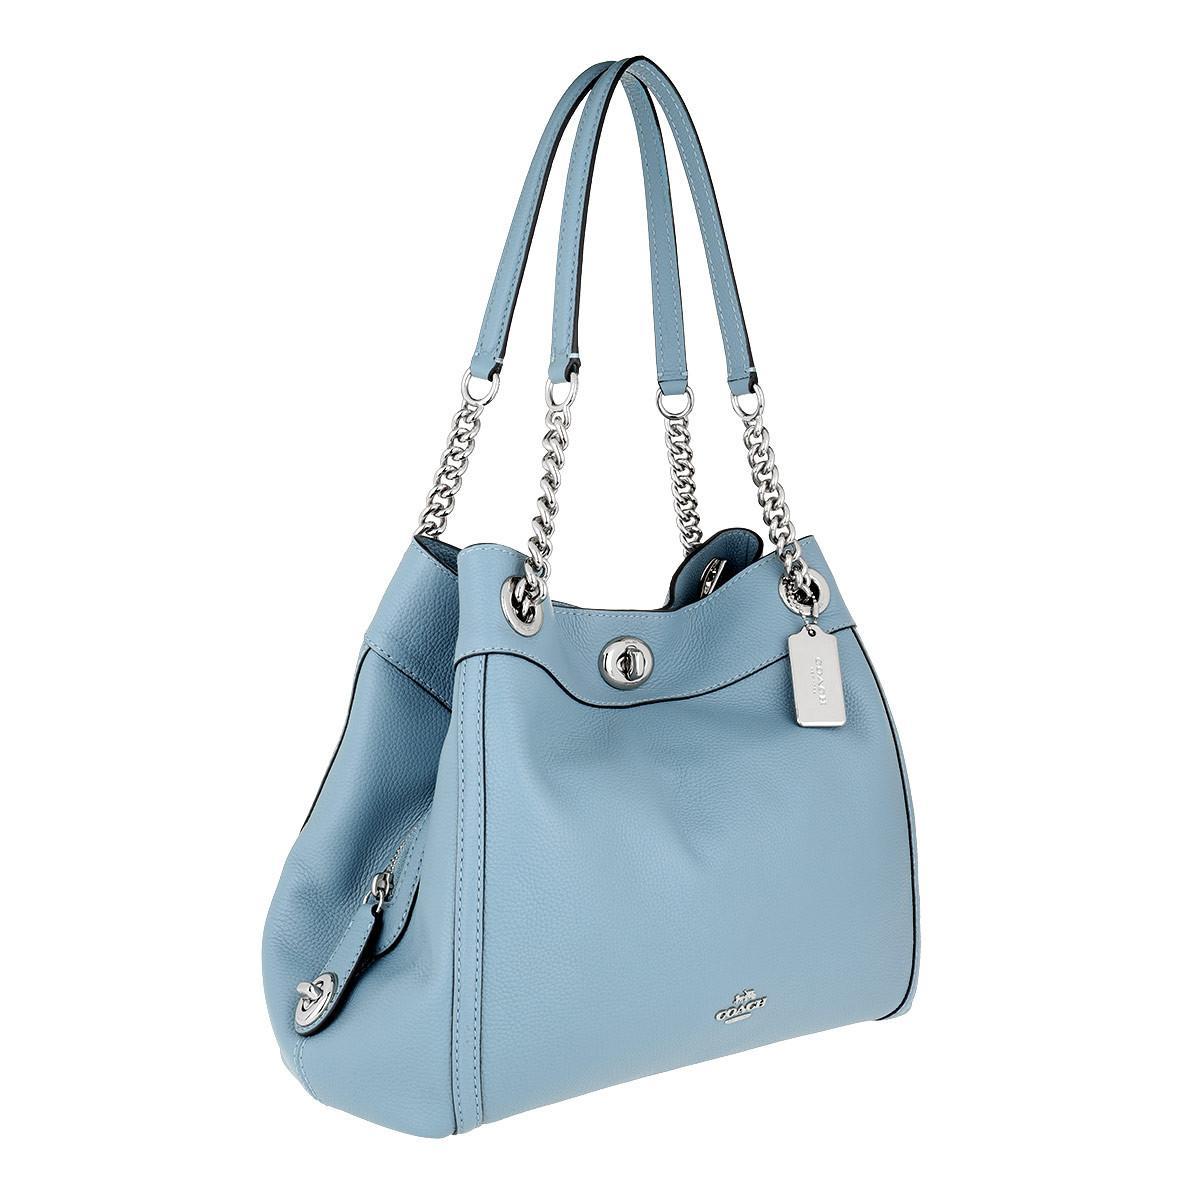 60e4cb643d4b COACH - Blue Polished Pebble Leather Turnlock Edie Shoulder Bag Grey -  Lyst. View fullscreen